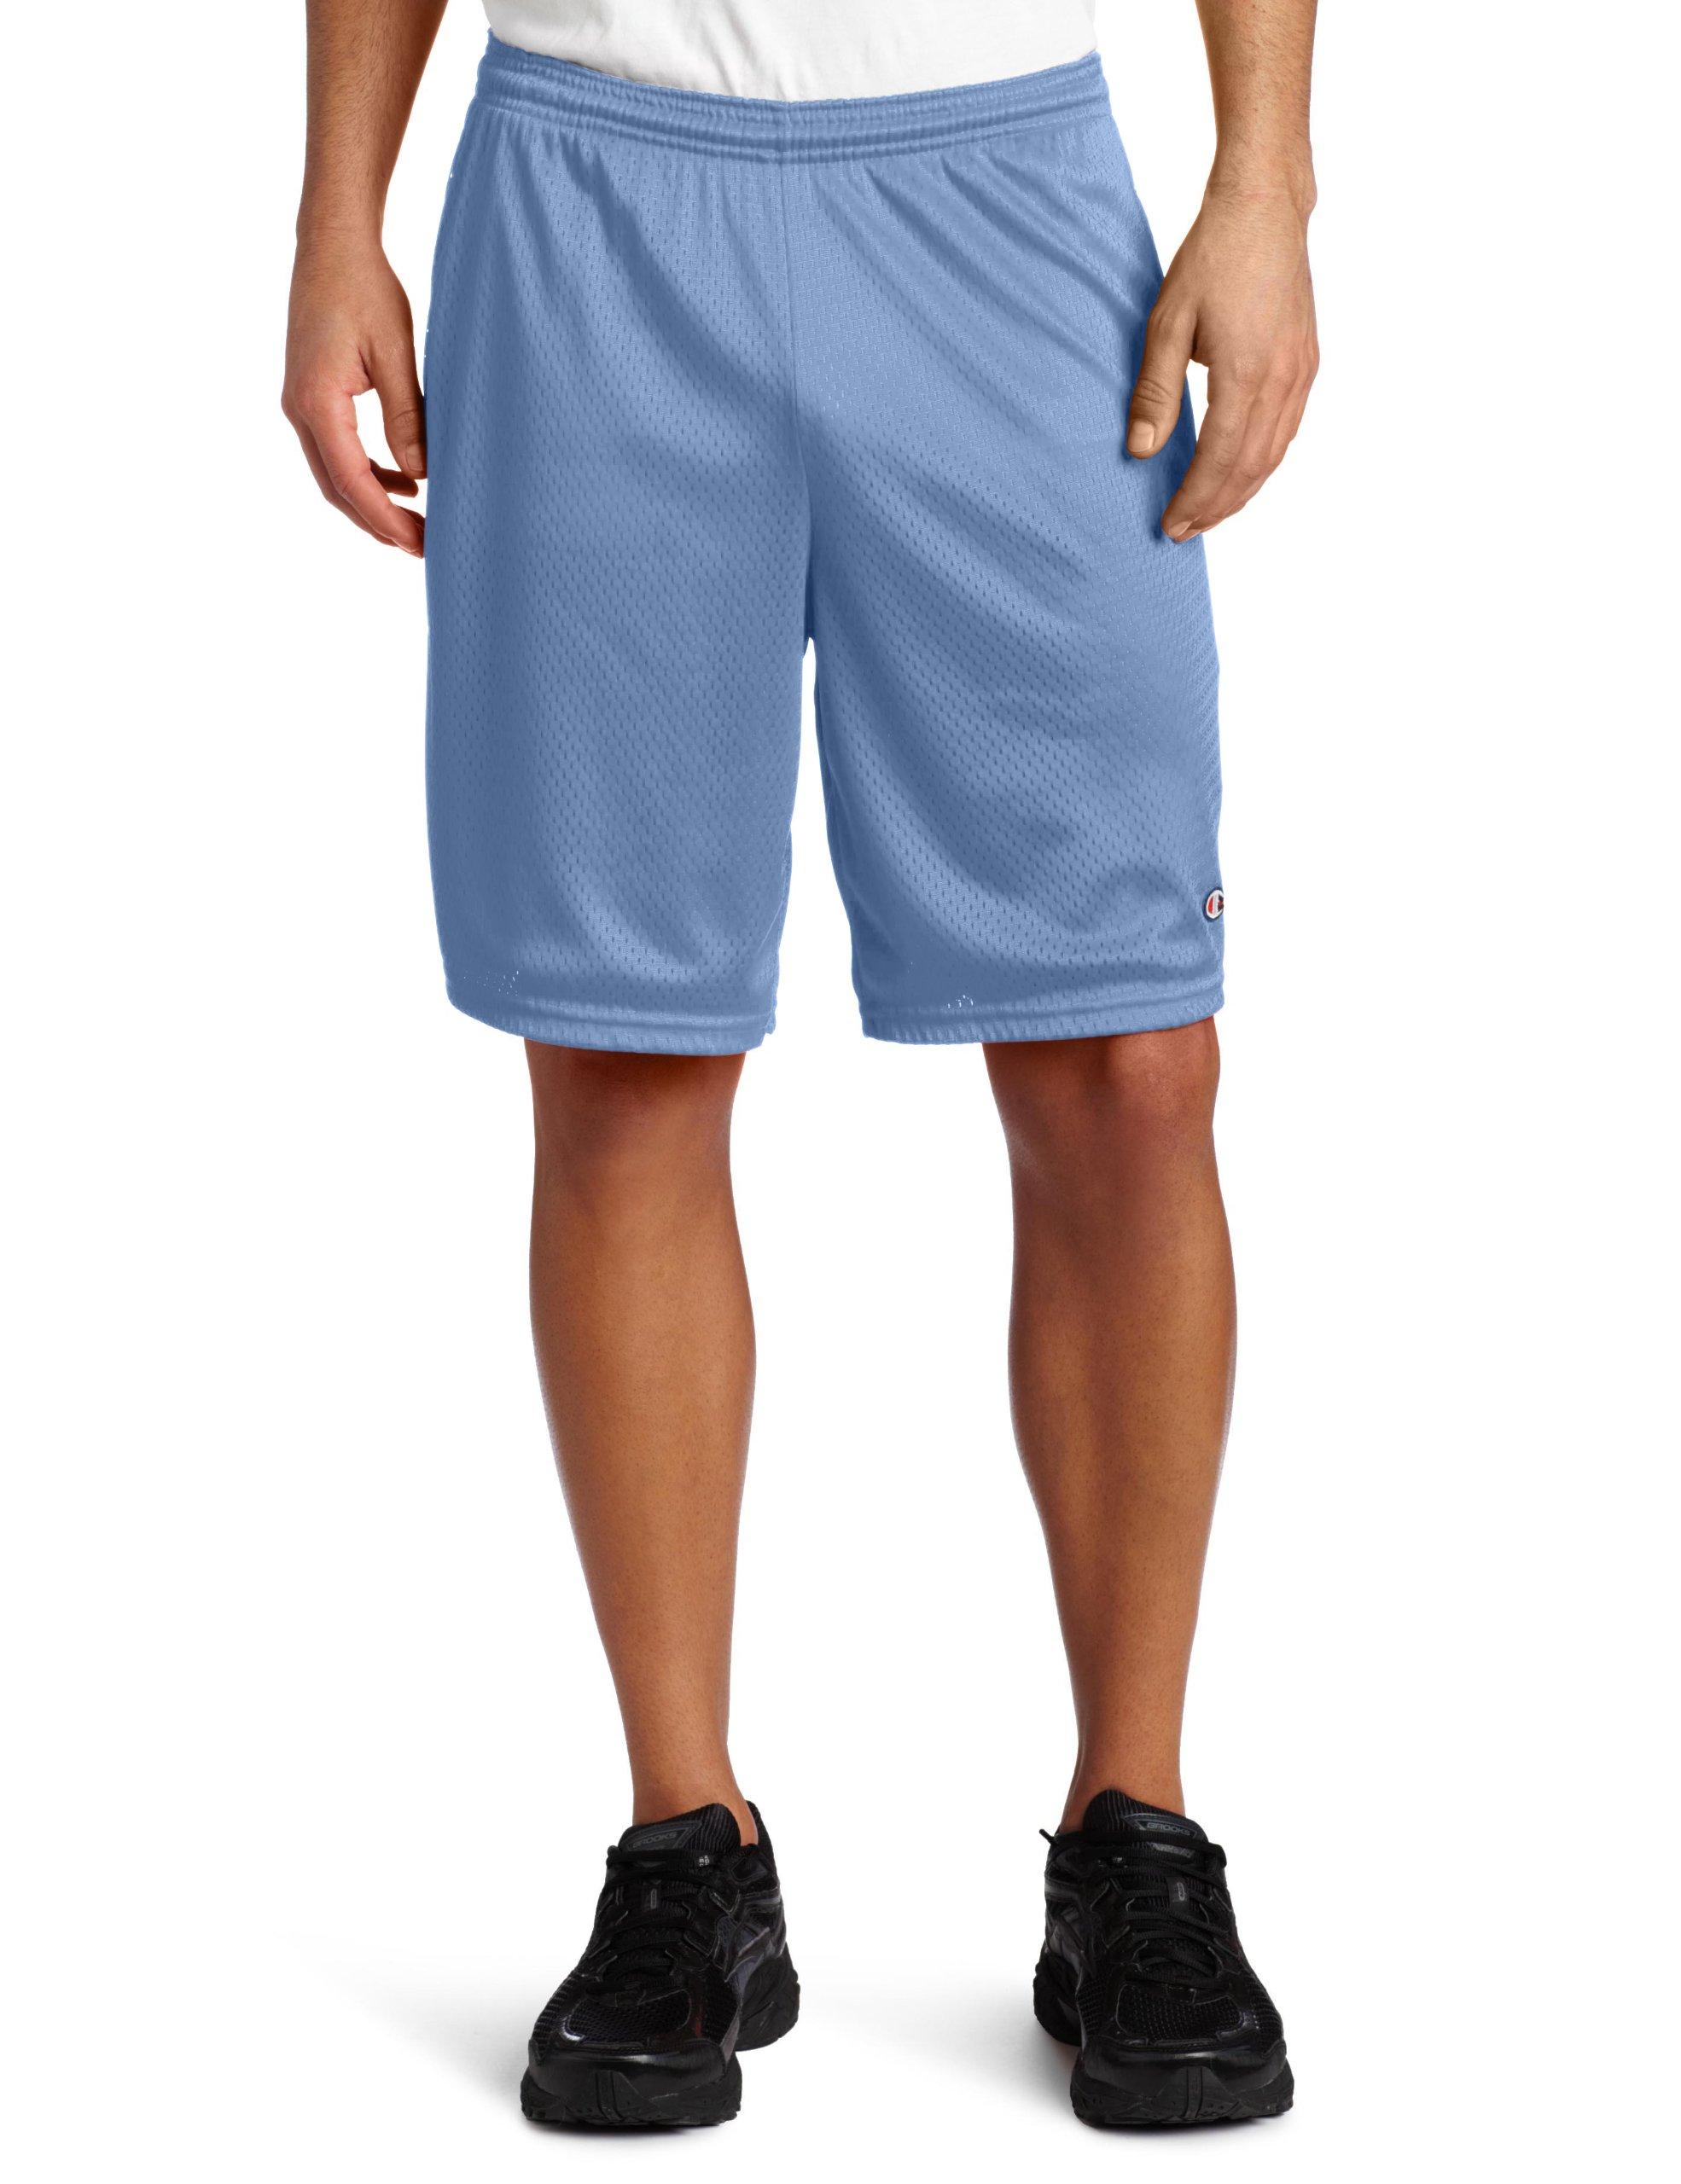 Champion Men's Long Mesh Short with Pockets,Light